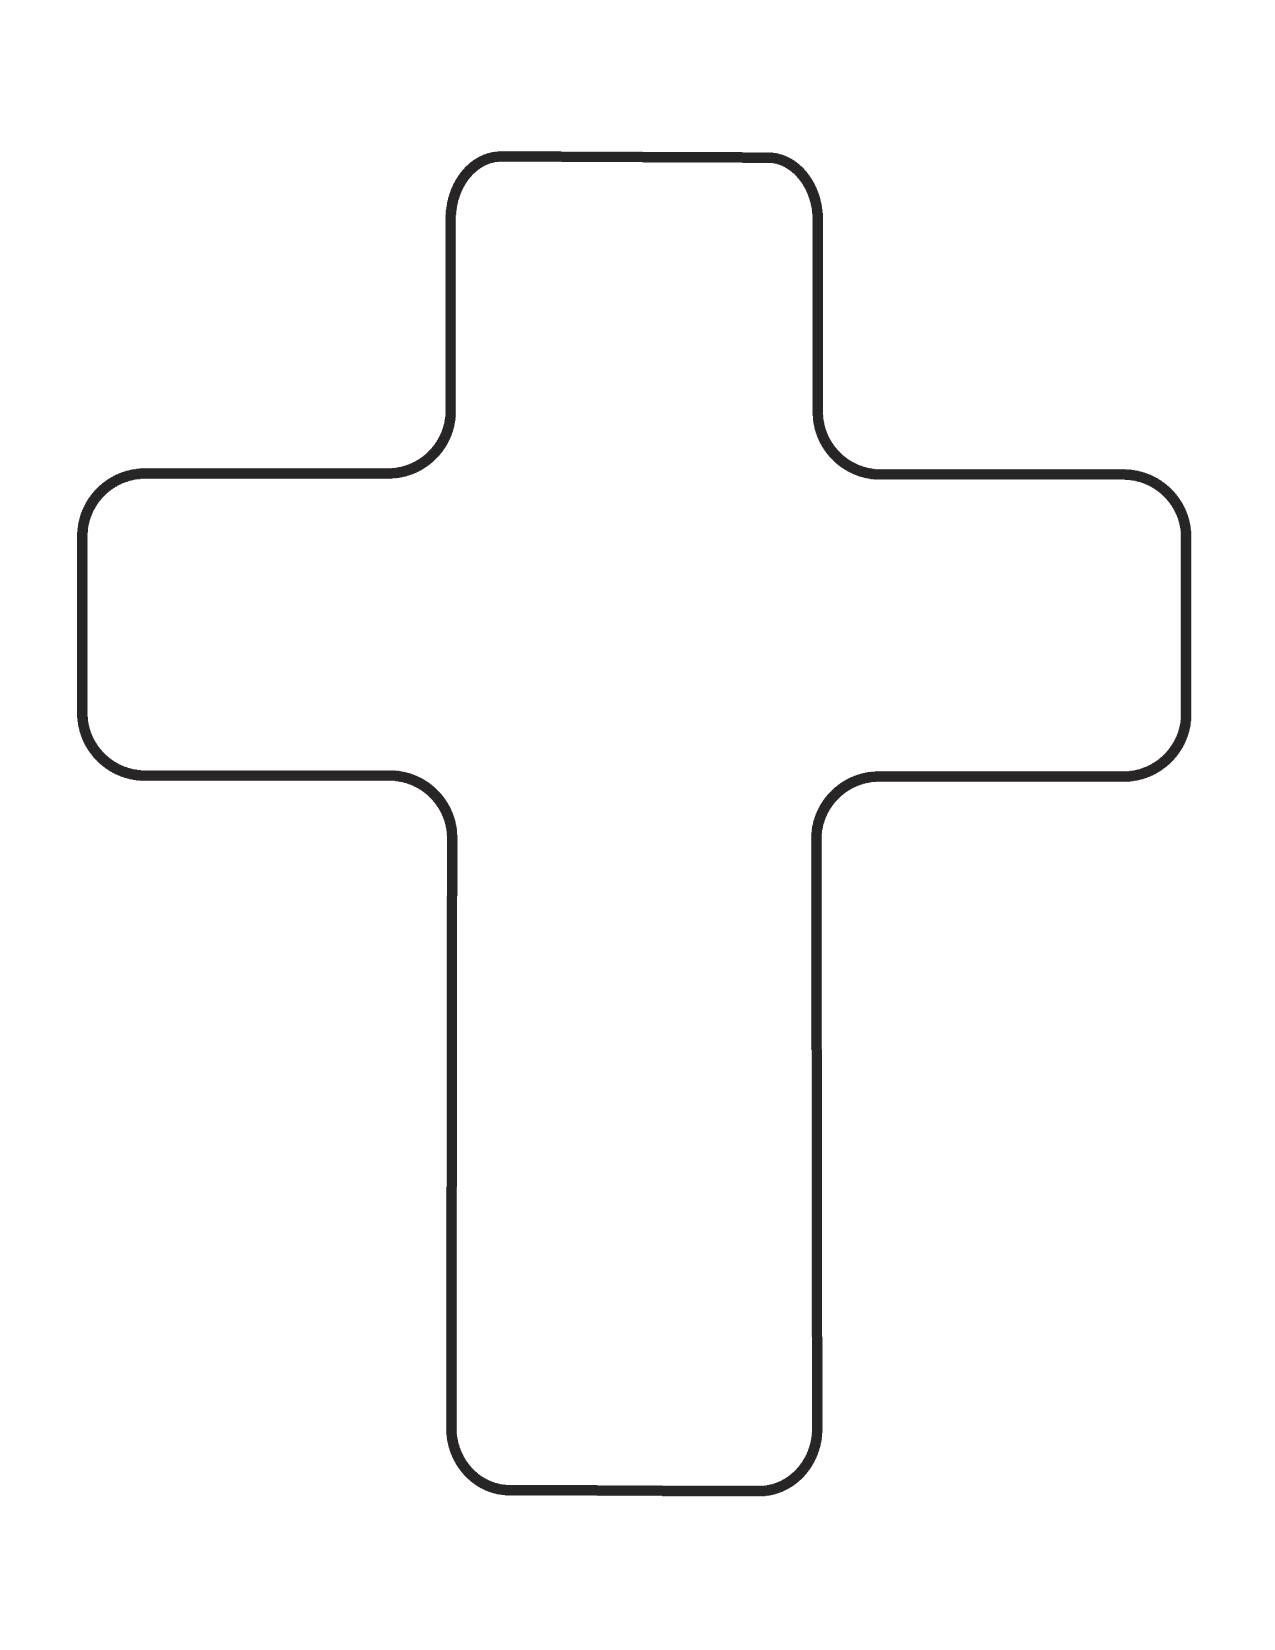 Black Christian Cross | Clipa - Free Clipart Of Crosses